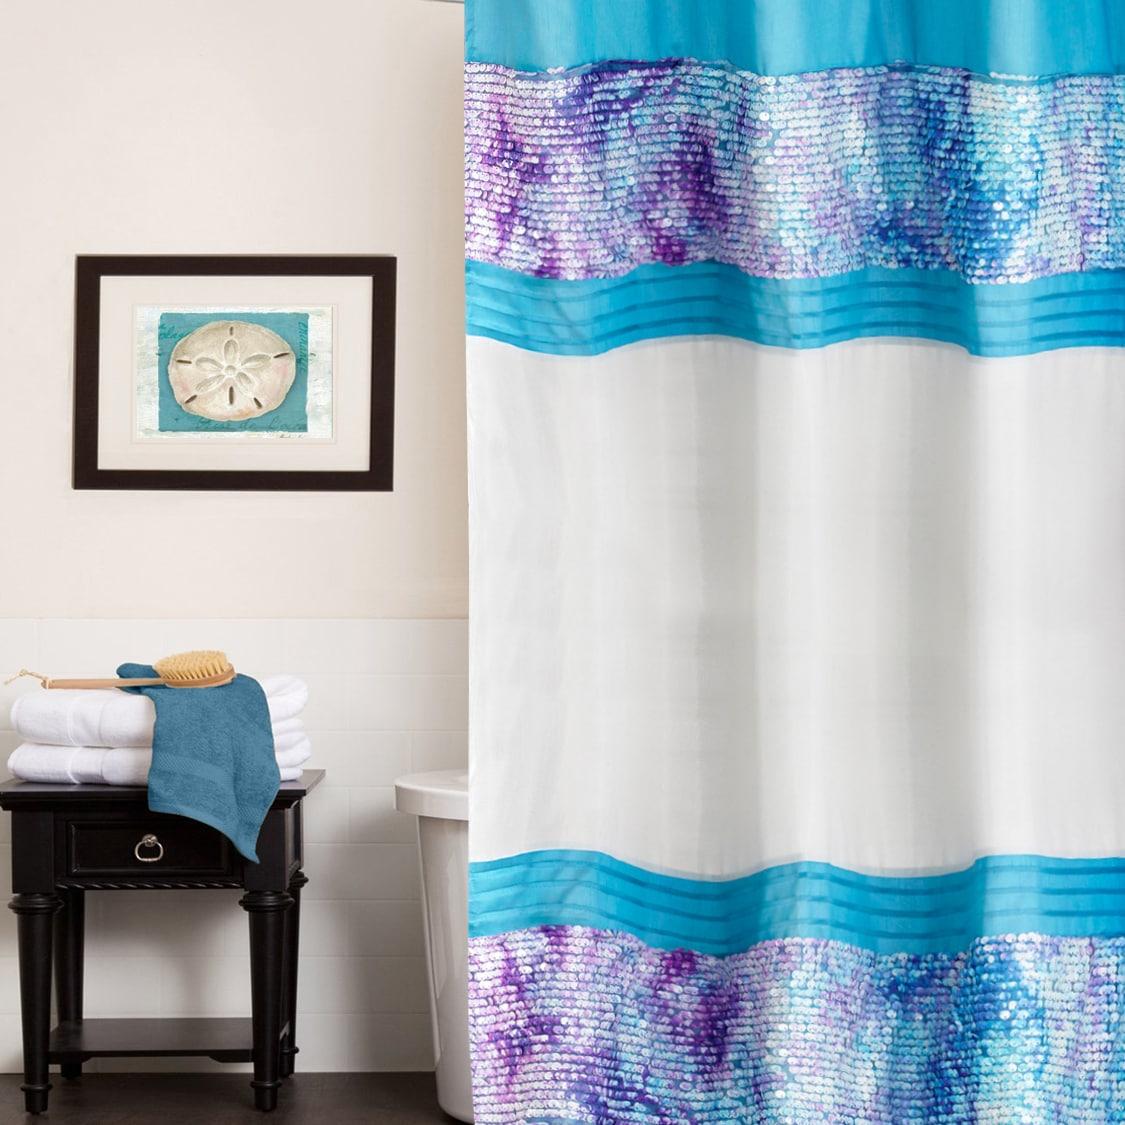 N Shimmering Aqua (Blue) Seashell Shower Curtain and Hook...